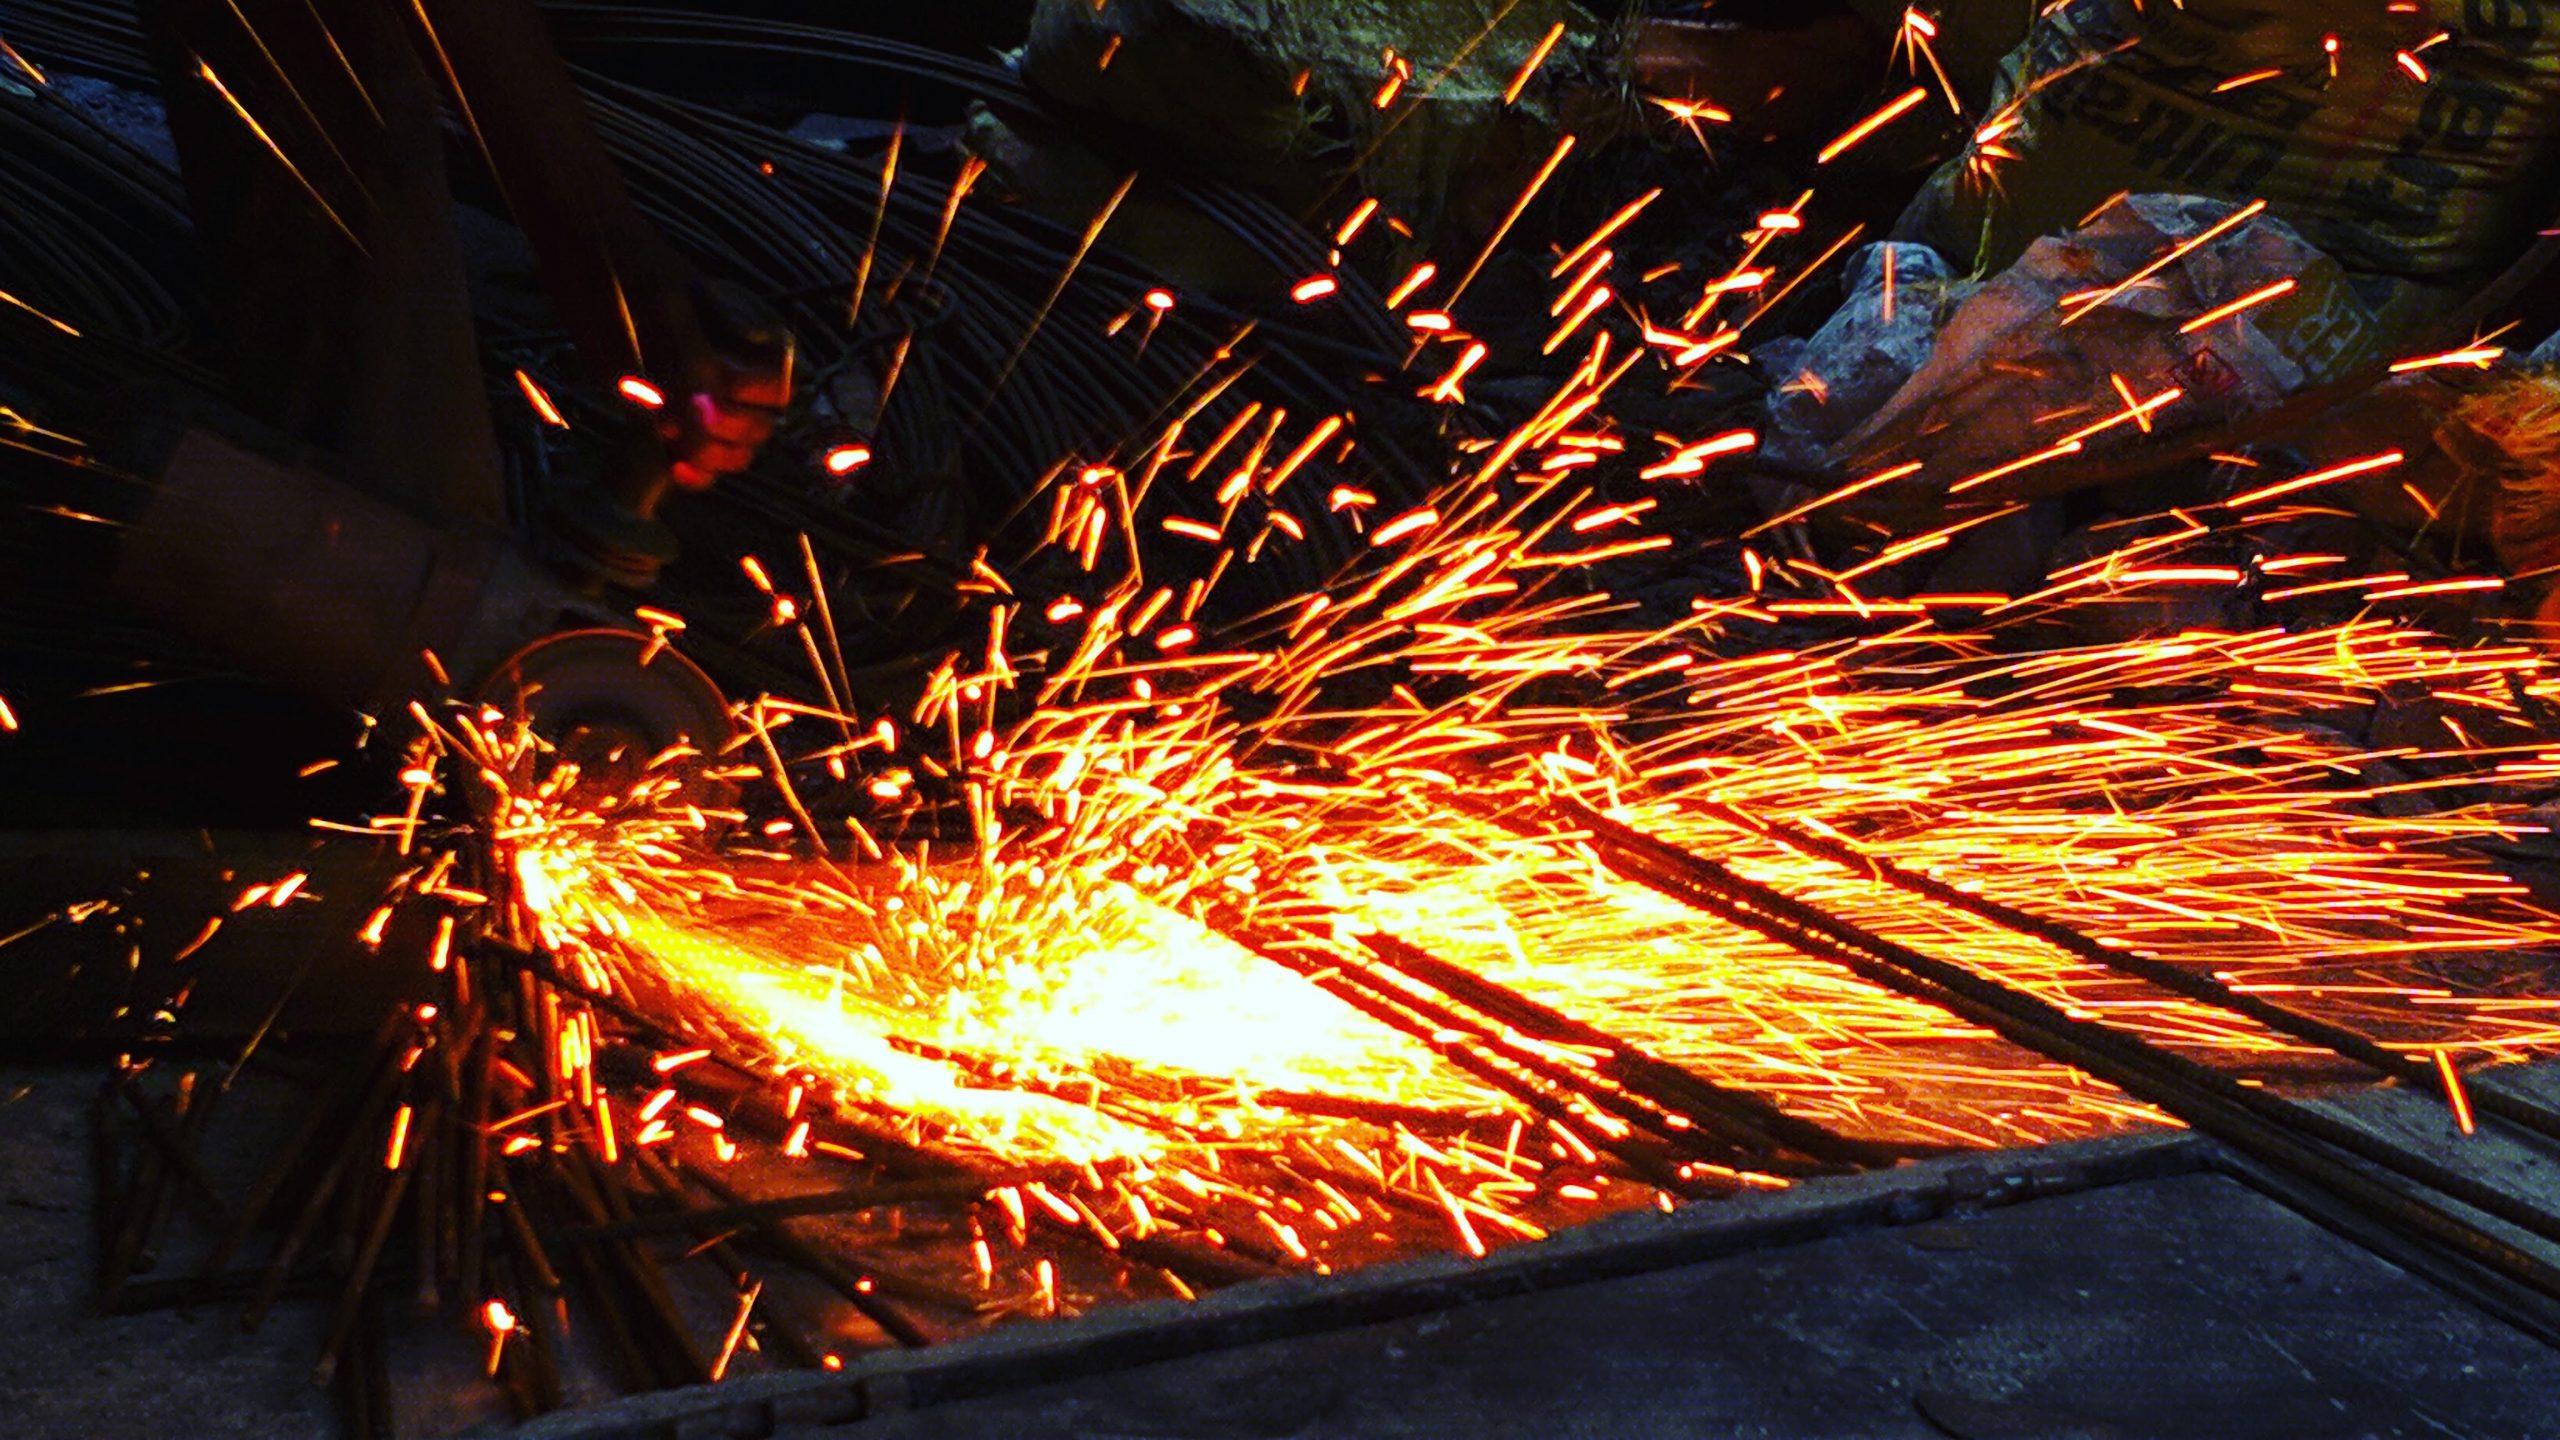 Welding work on metallic structure